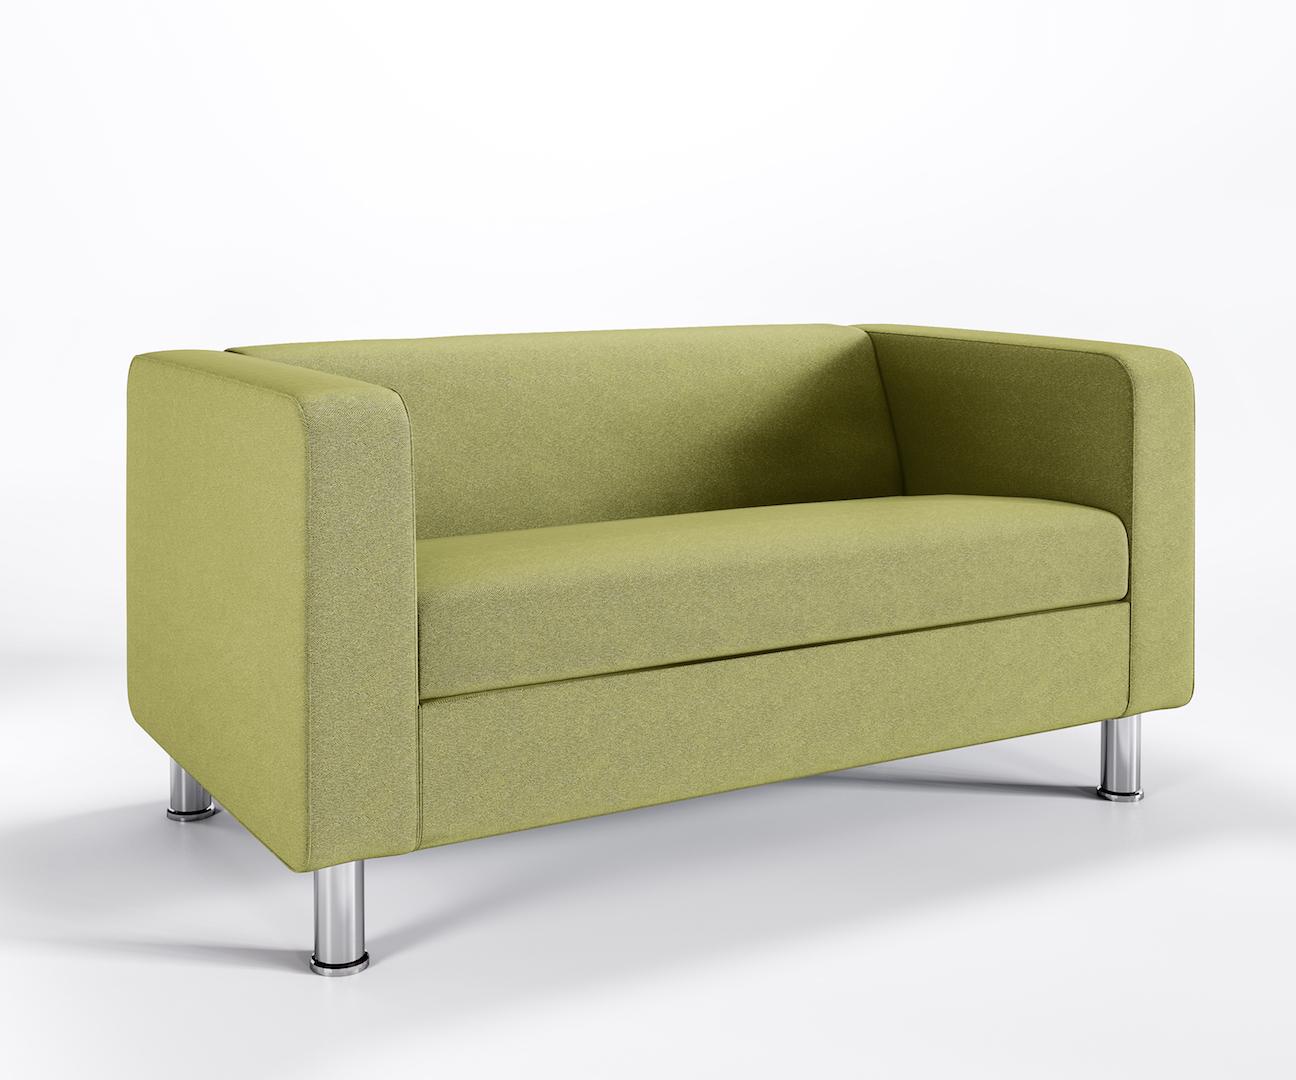 loungesofa 2 sitzer cubby 4n cocktailsofa hotelsofa. Black Bedroom Furniture Sets. Home Design Ideas